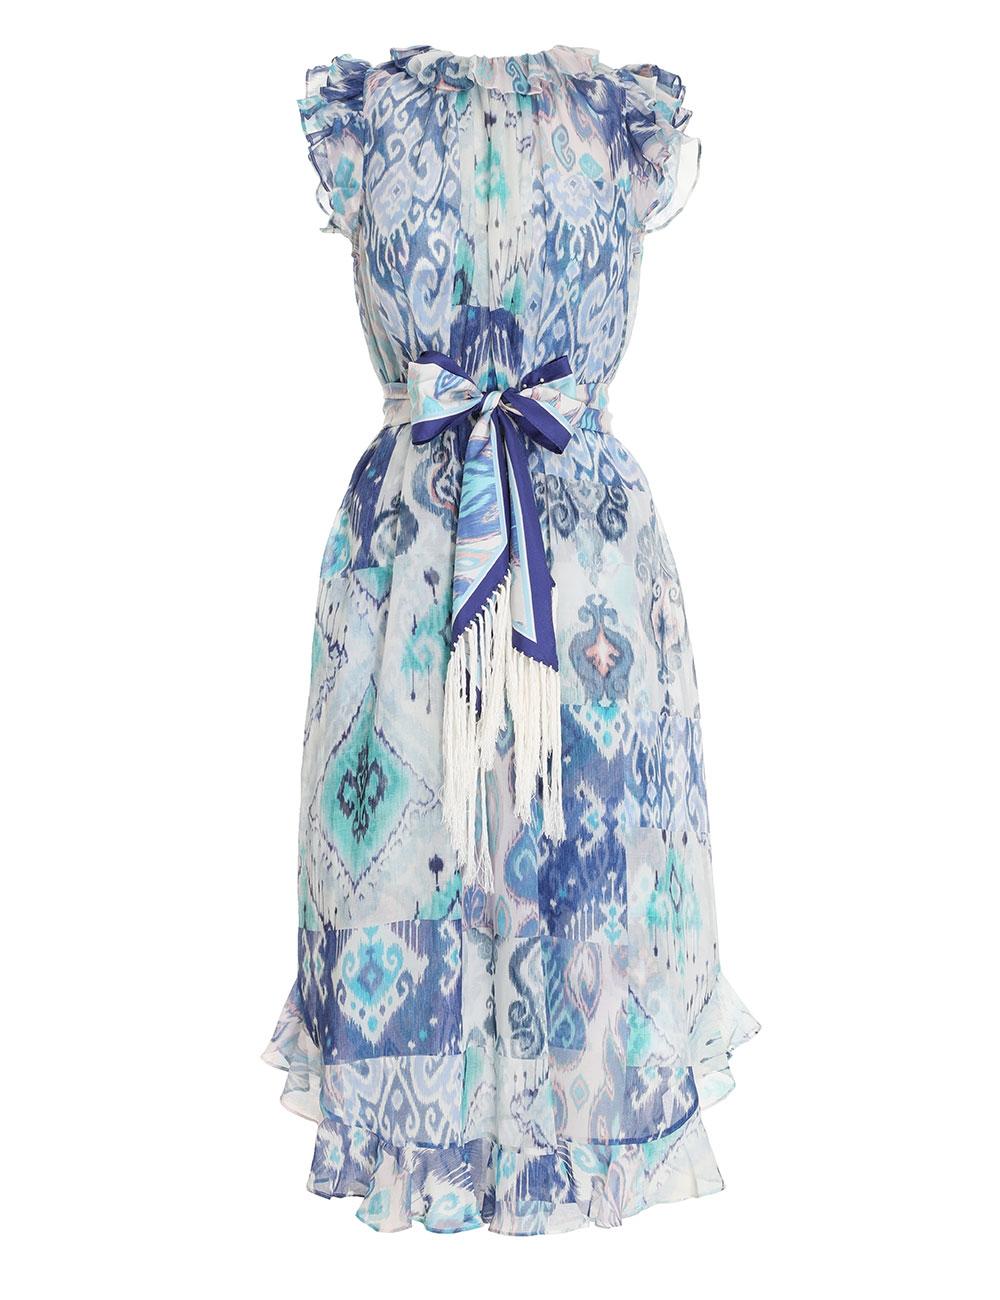 Glassy Ruffle Shoulder Dress